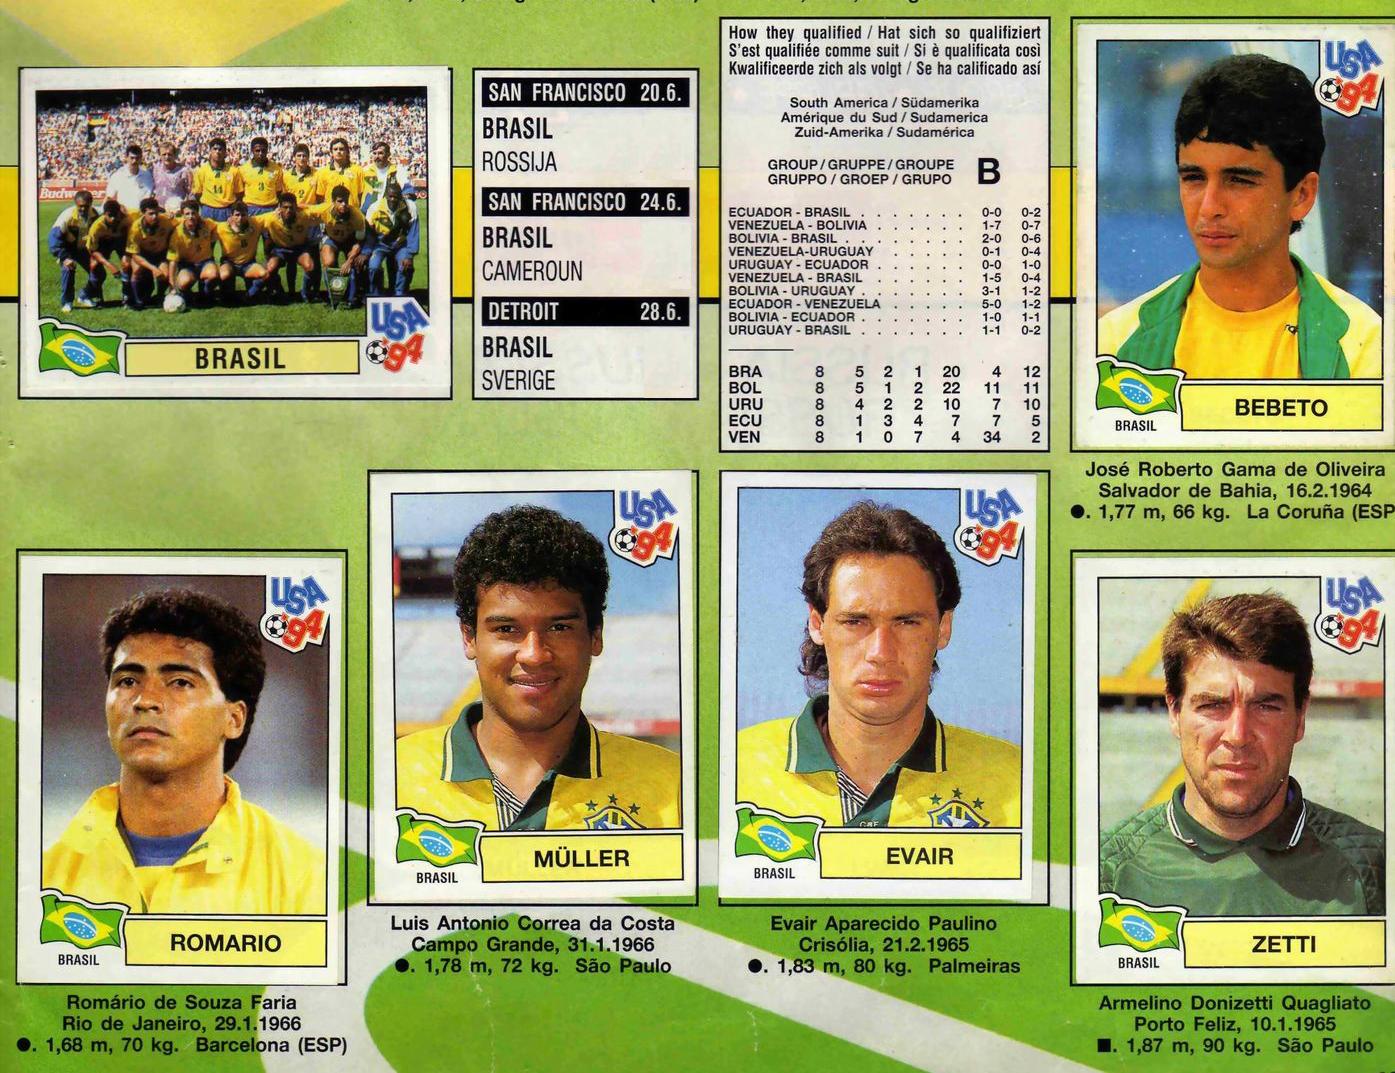 ¿Cuánto mide Bebeto? - Real height Brasil_94_04